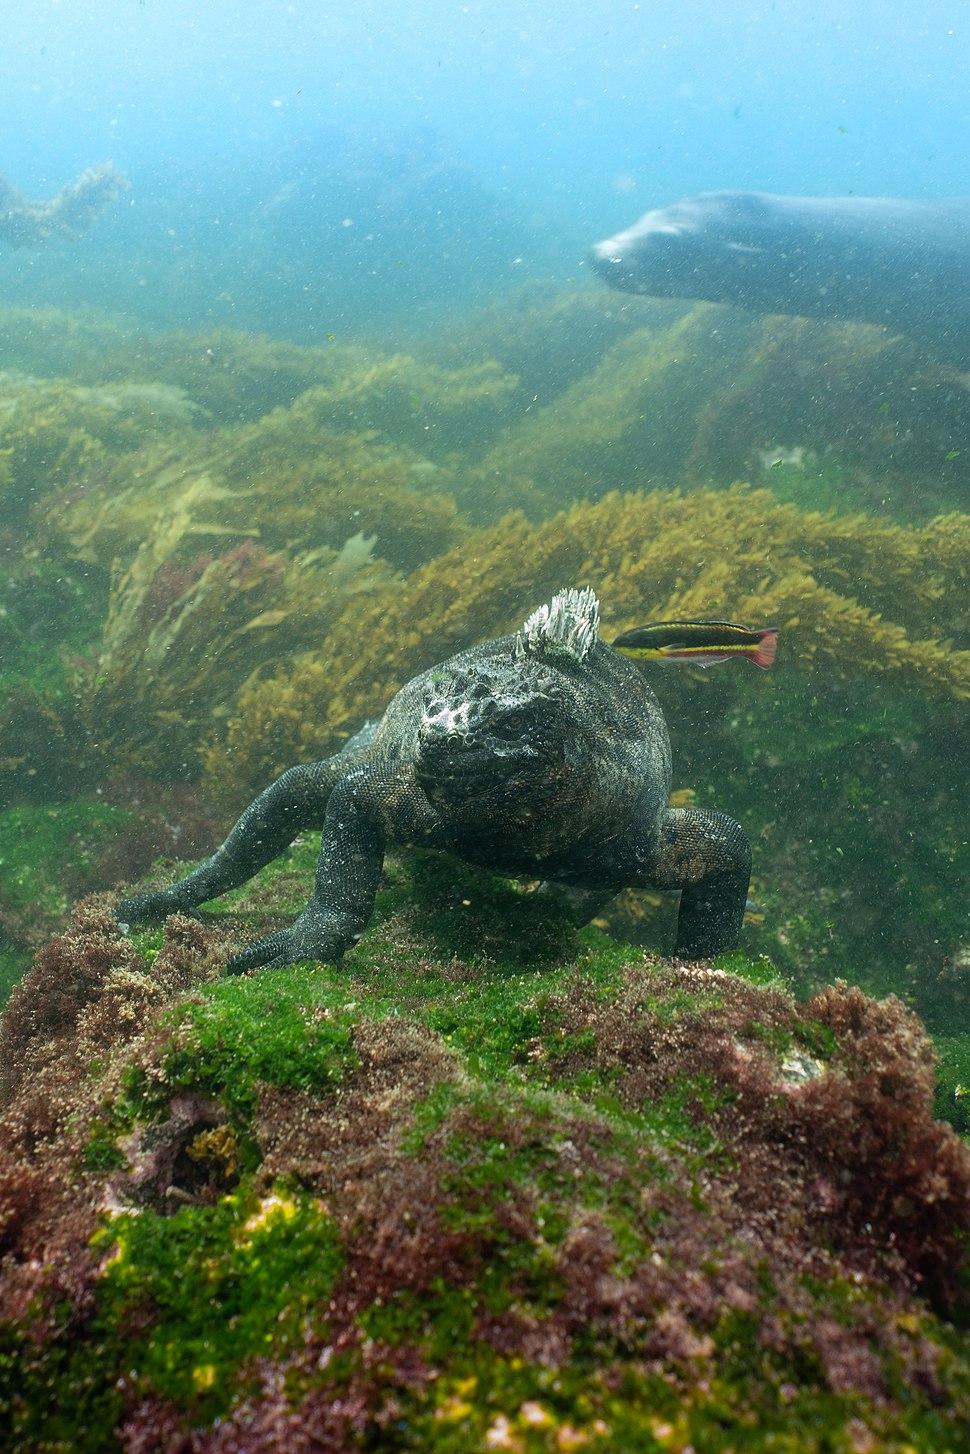 Marine Iguana (Amblyrhynchus cristatus) feeding underwater off Fernandina Island, Galápagos Islands